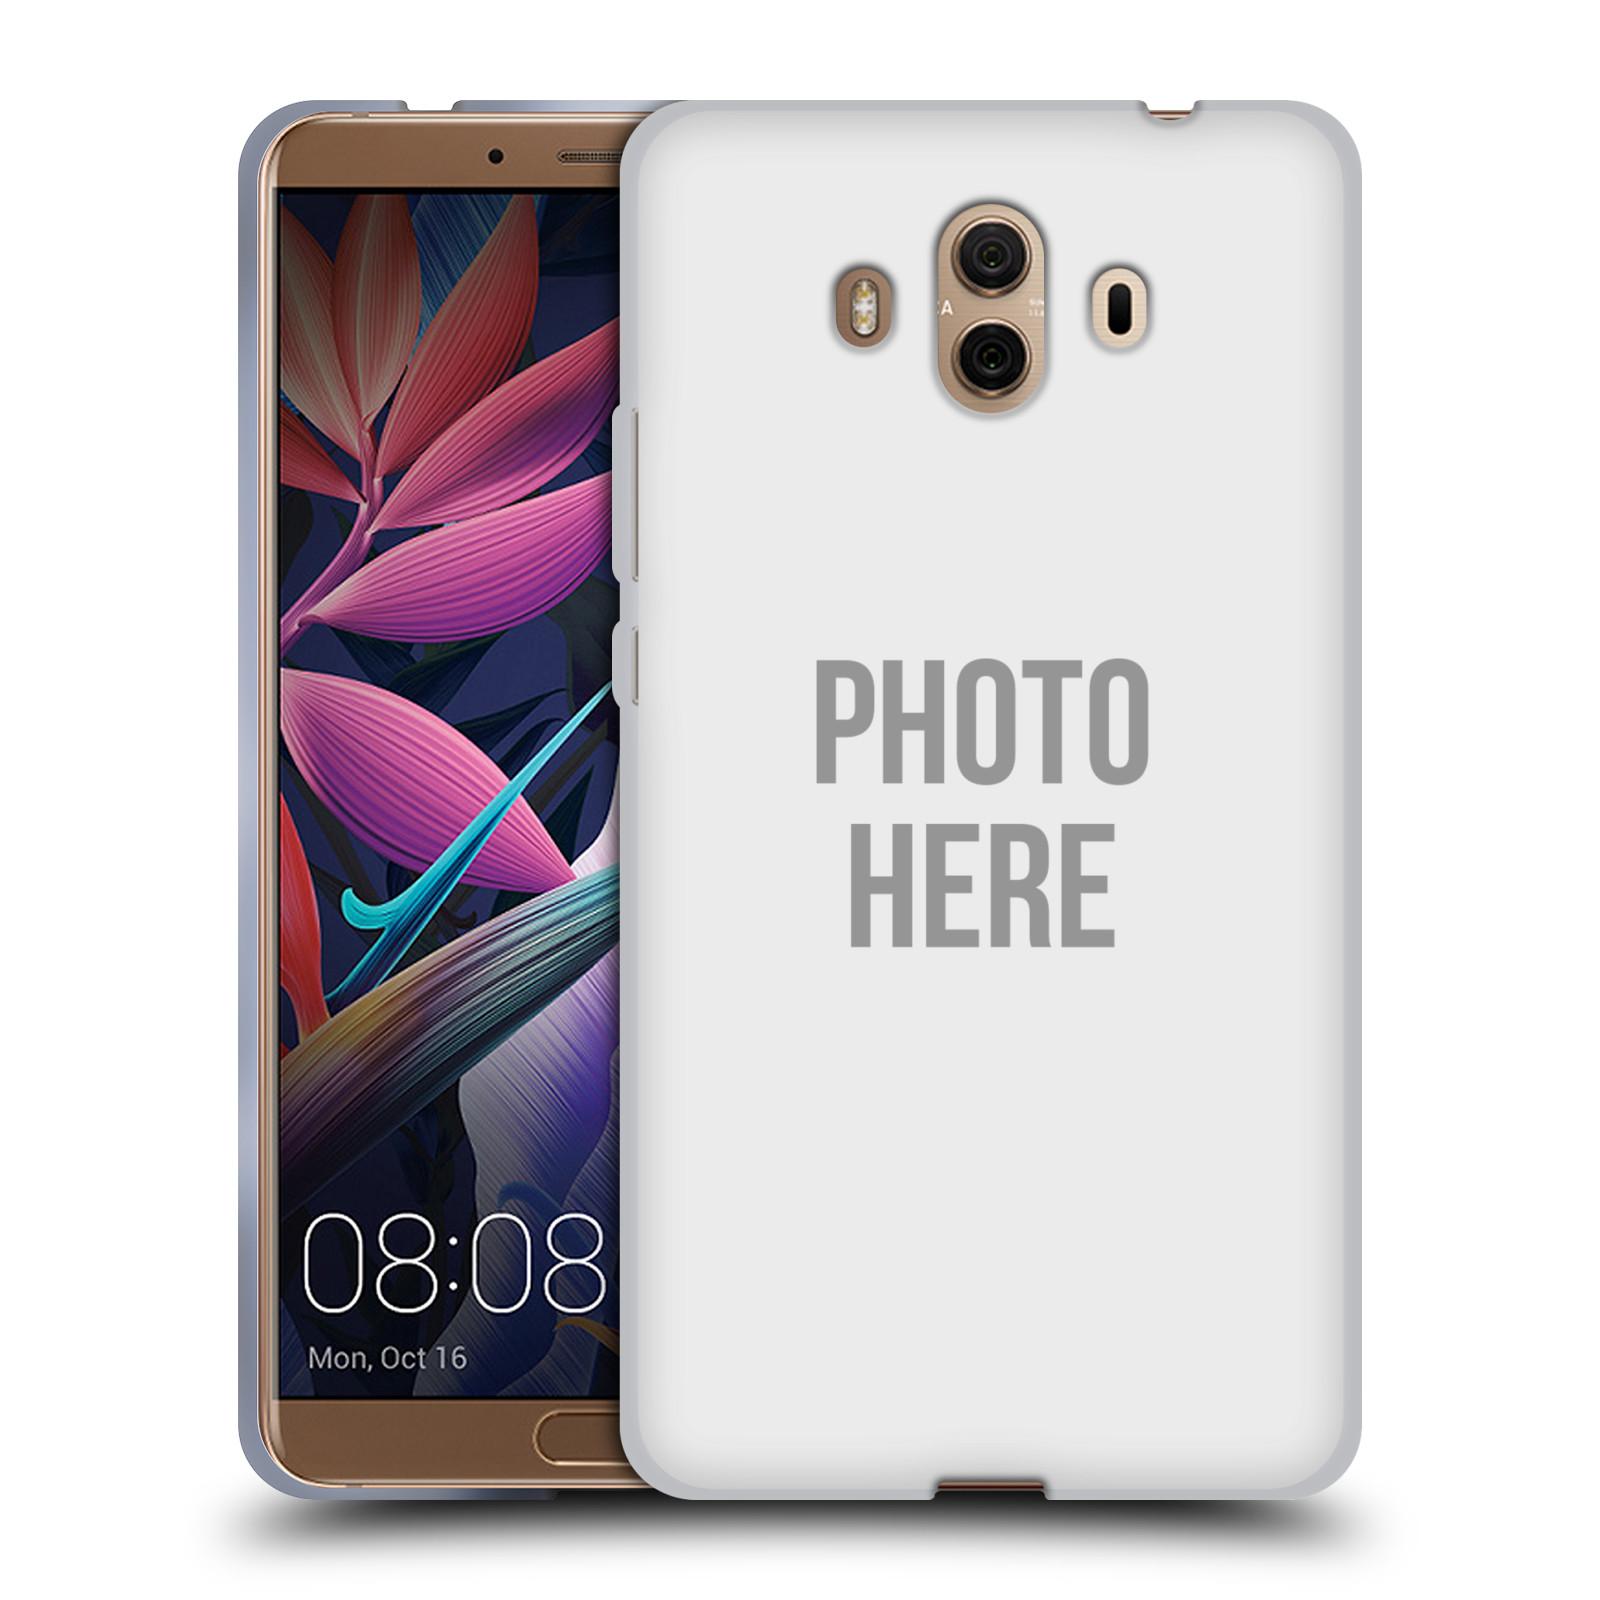 Silikonové pouzdro na mobil Huawei Mate 10 - Head Case - s vlastním motivem